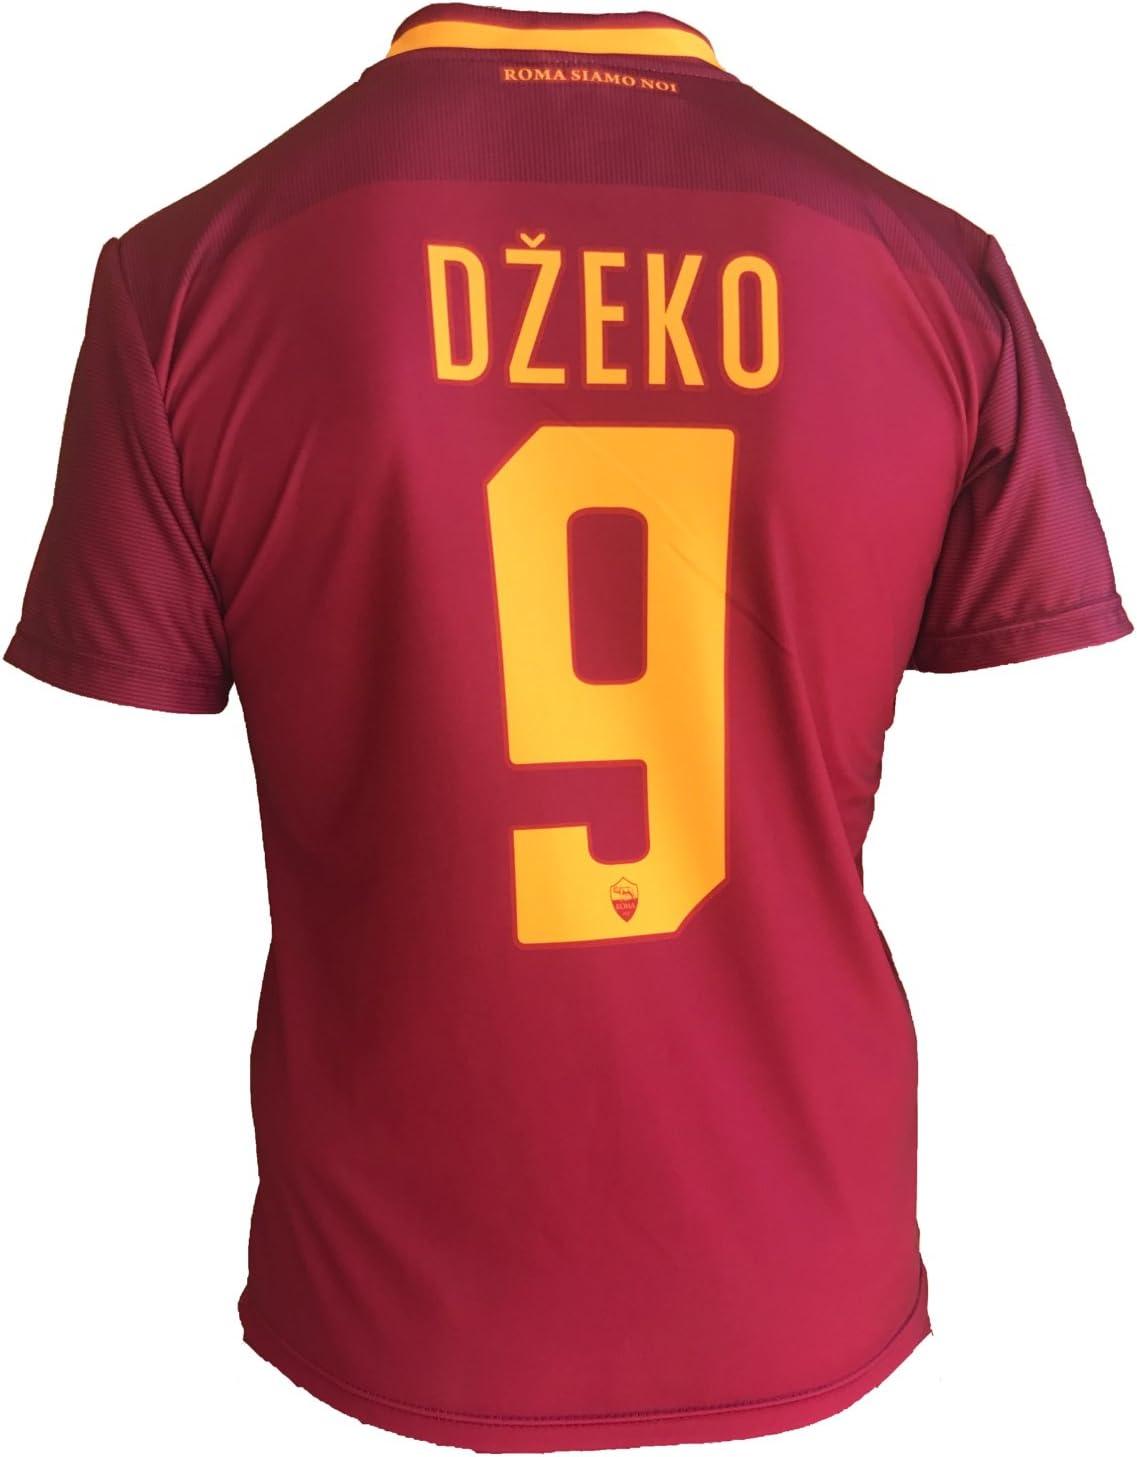 Camiseta de fútbol Roma Edin Dzeko 9, réplica autorizada, 2017 ...